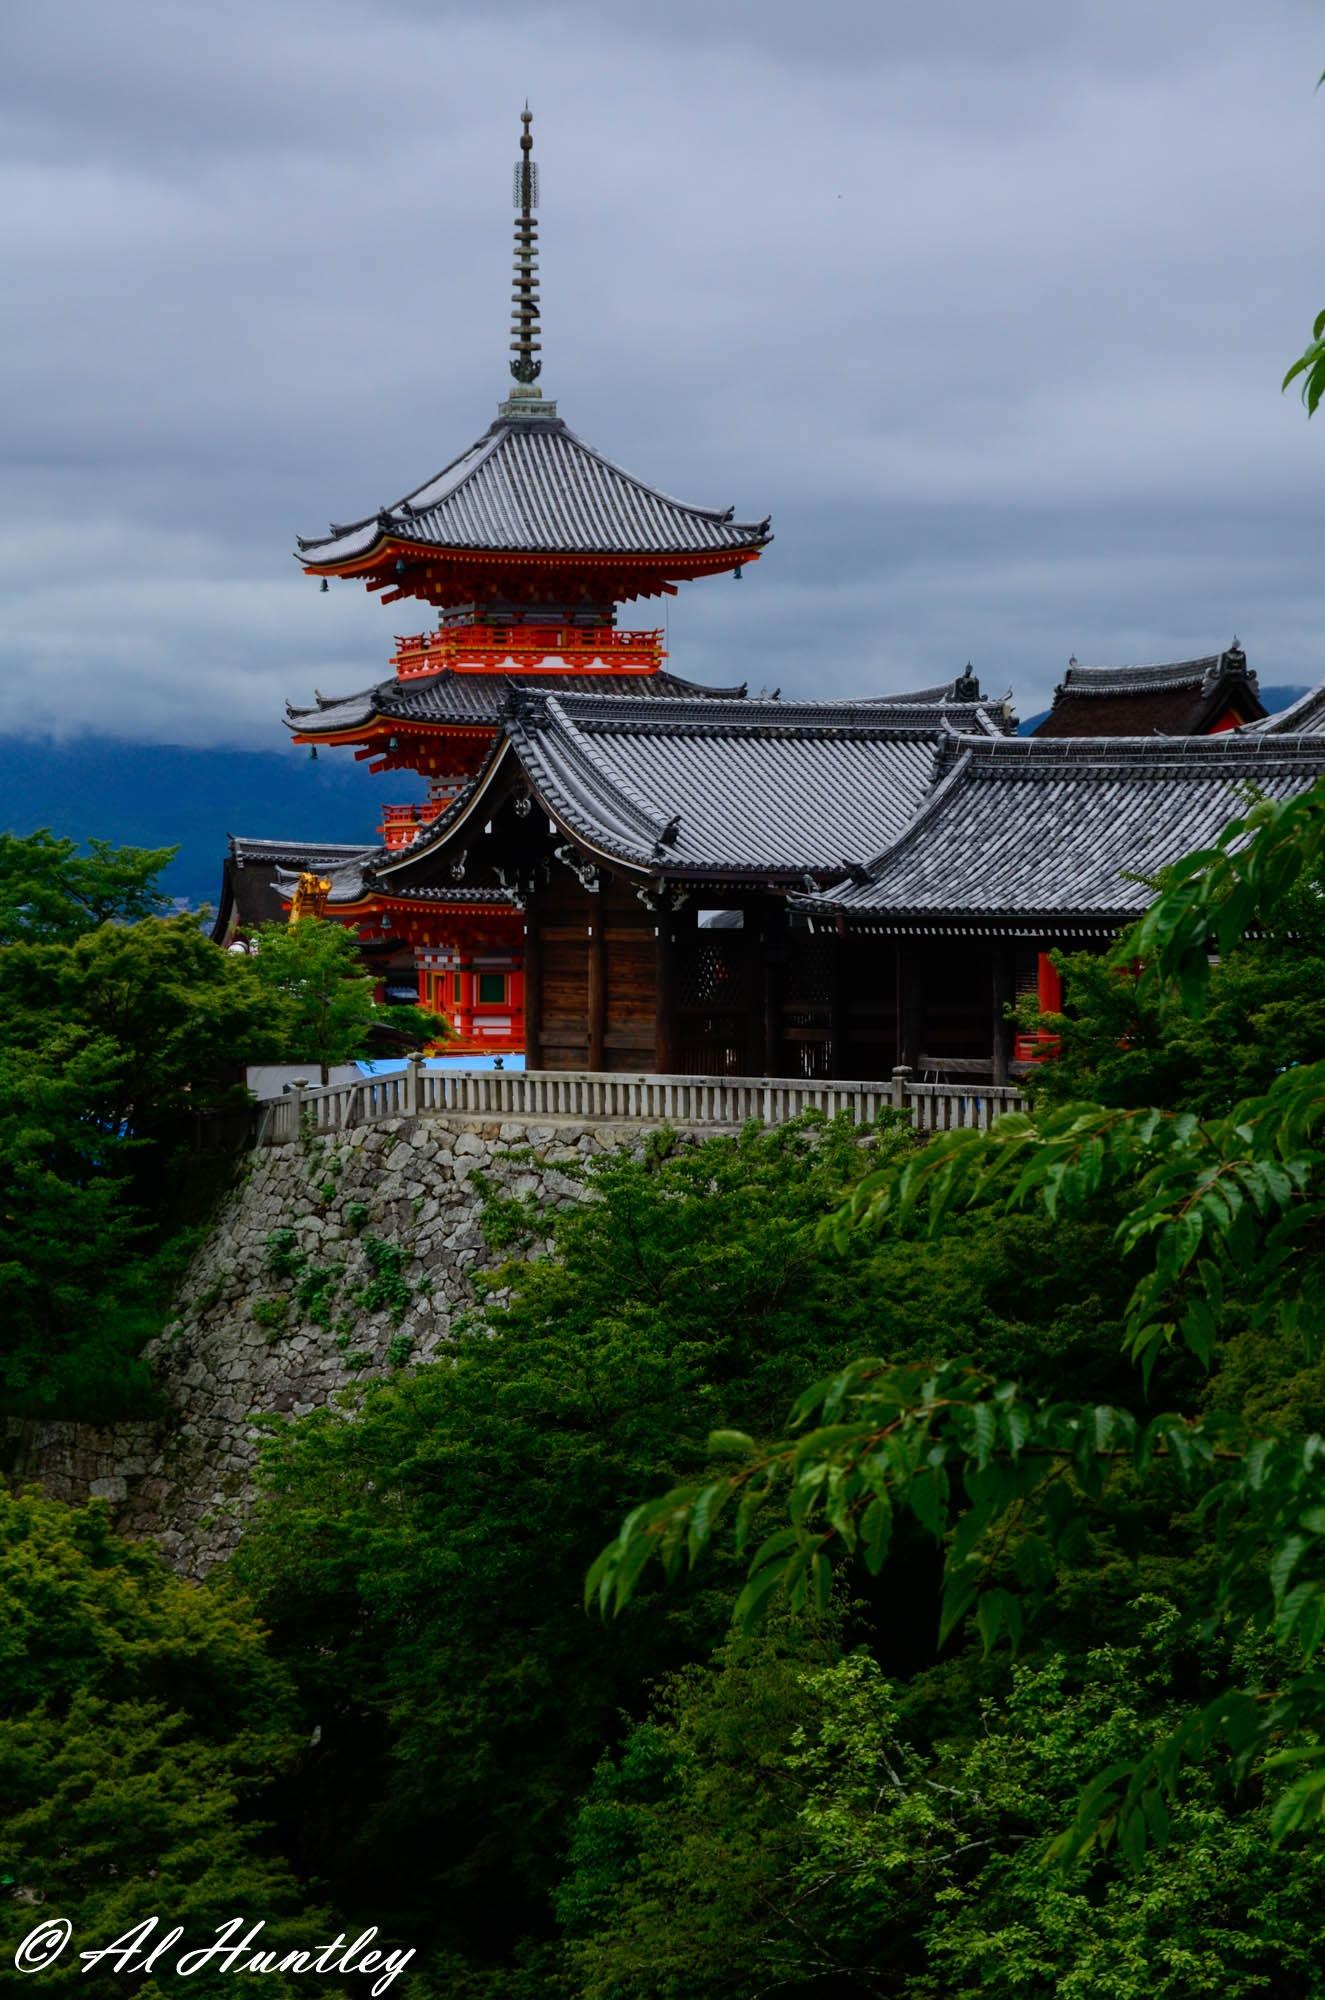 Pagoda at Kiyomizu-dera Temple by ALTON HUNTLEY